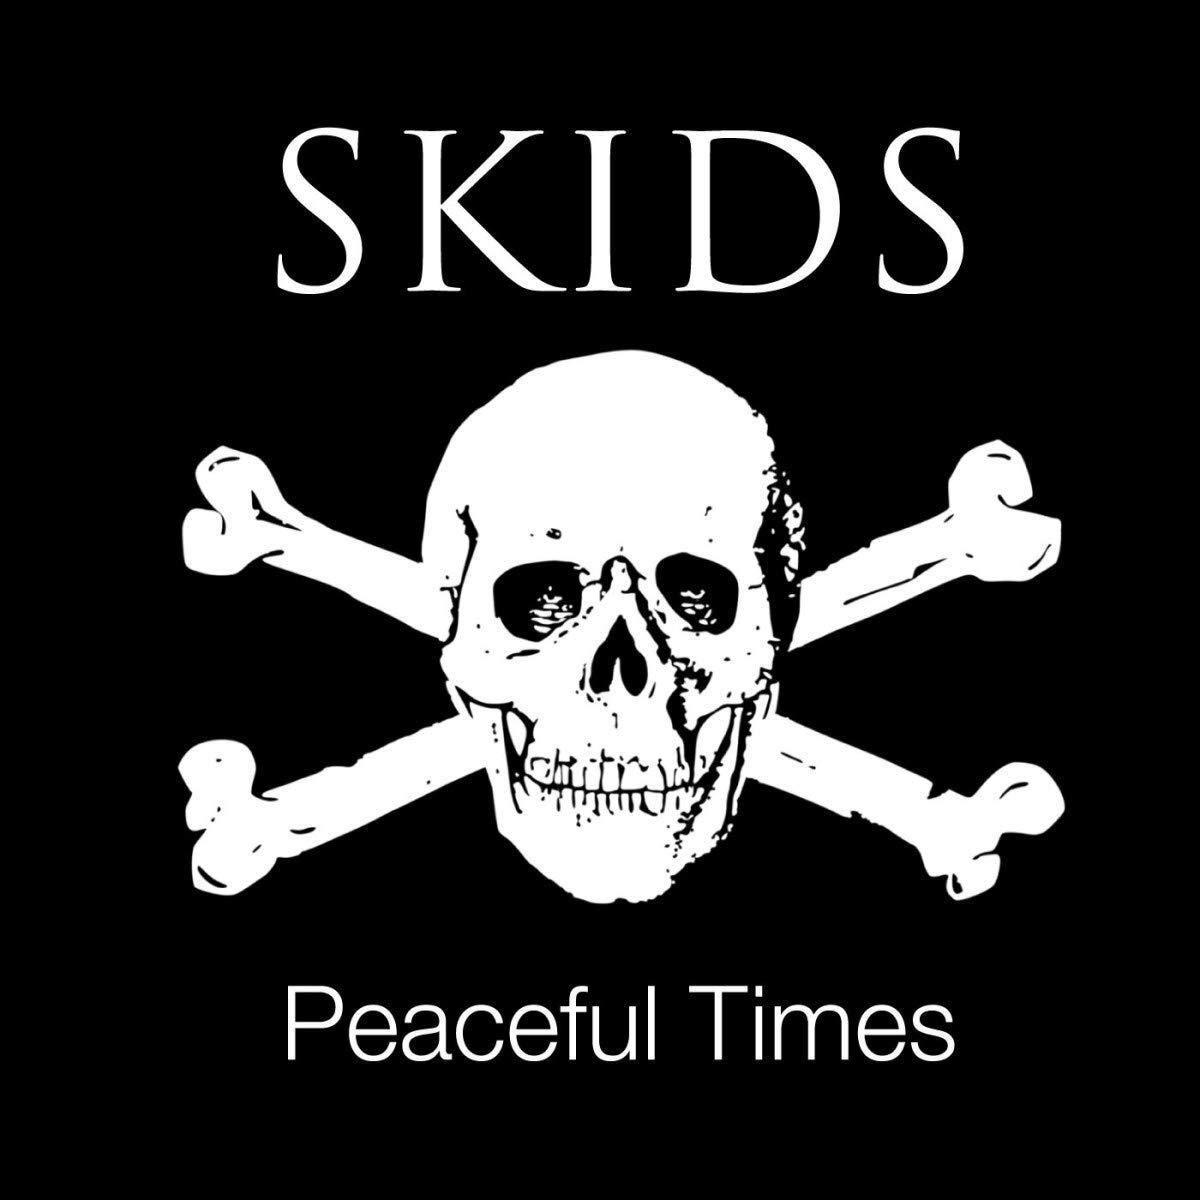 Skids - Peaceful Times [White VINYL] £7.09 (Prime) + £2.99 (non Prime) at Amazon + Auto Rip